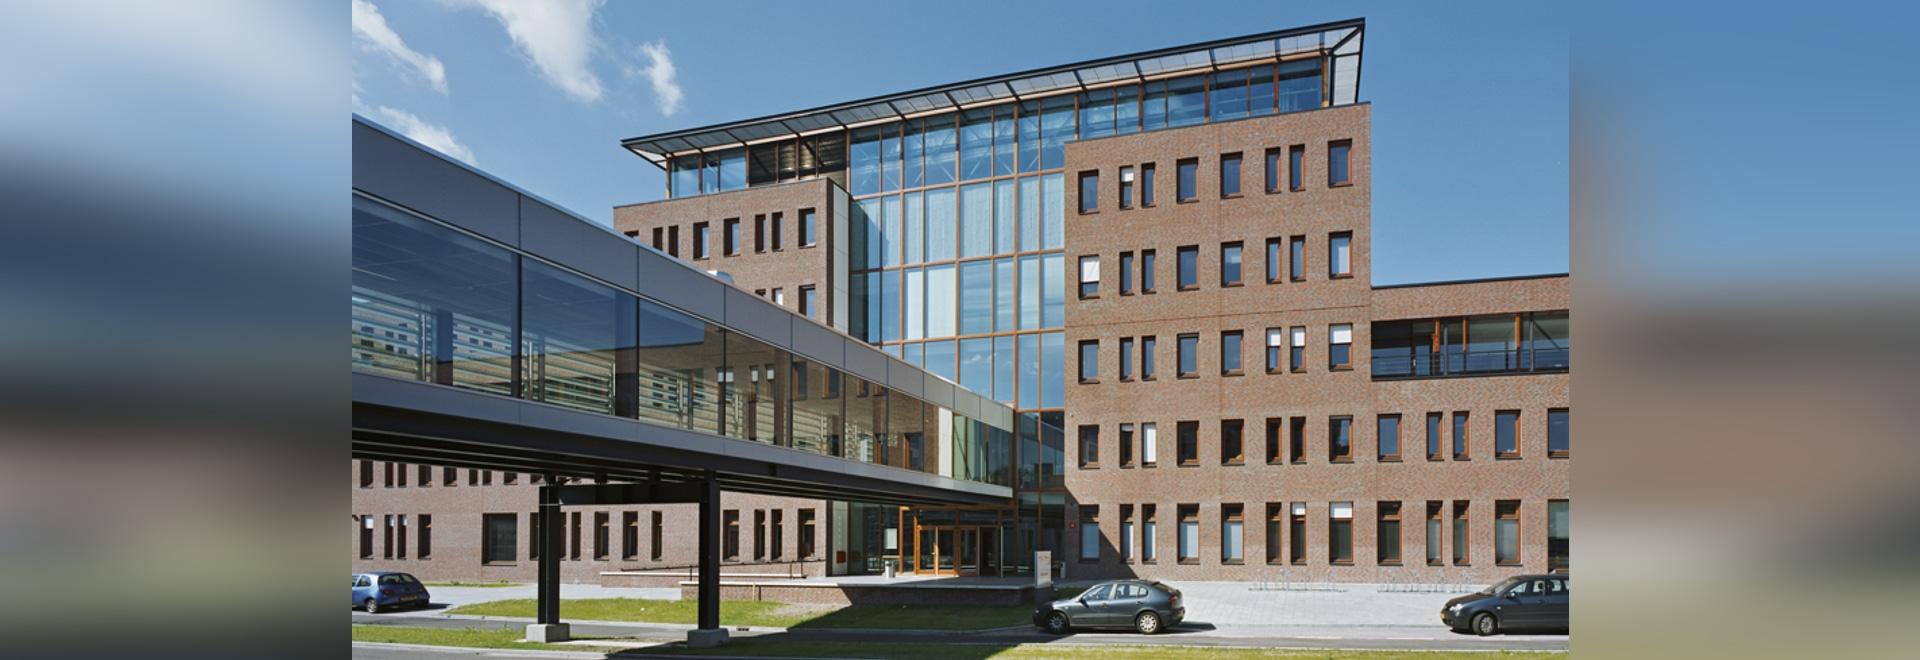 Centre psychiatrique scolaire (RPA), Amsterdam